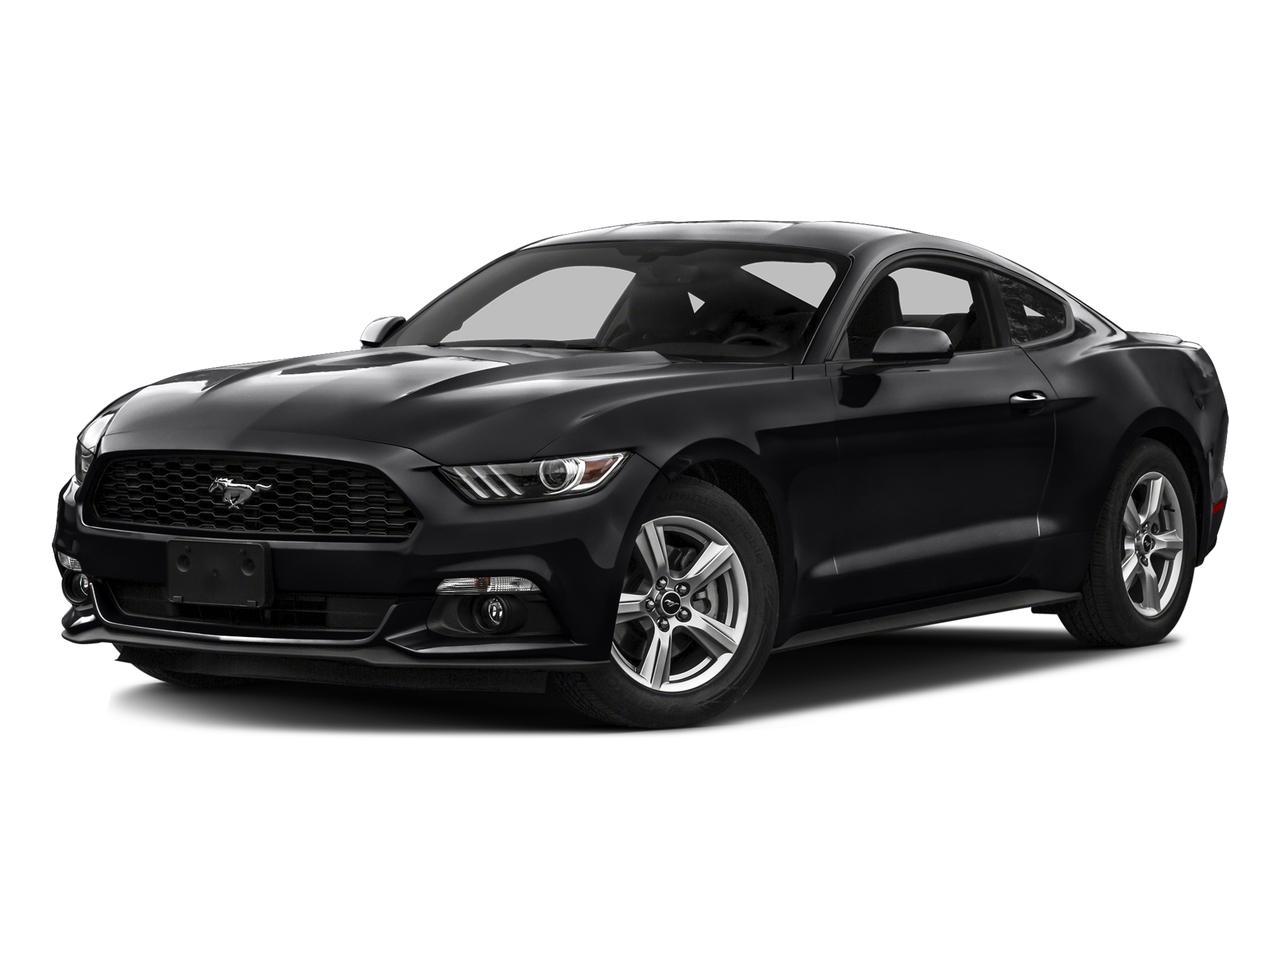 2016 Ford Mustang Vehicle Photo in San Antonio, TX 78238